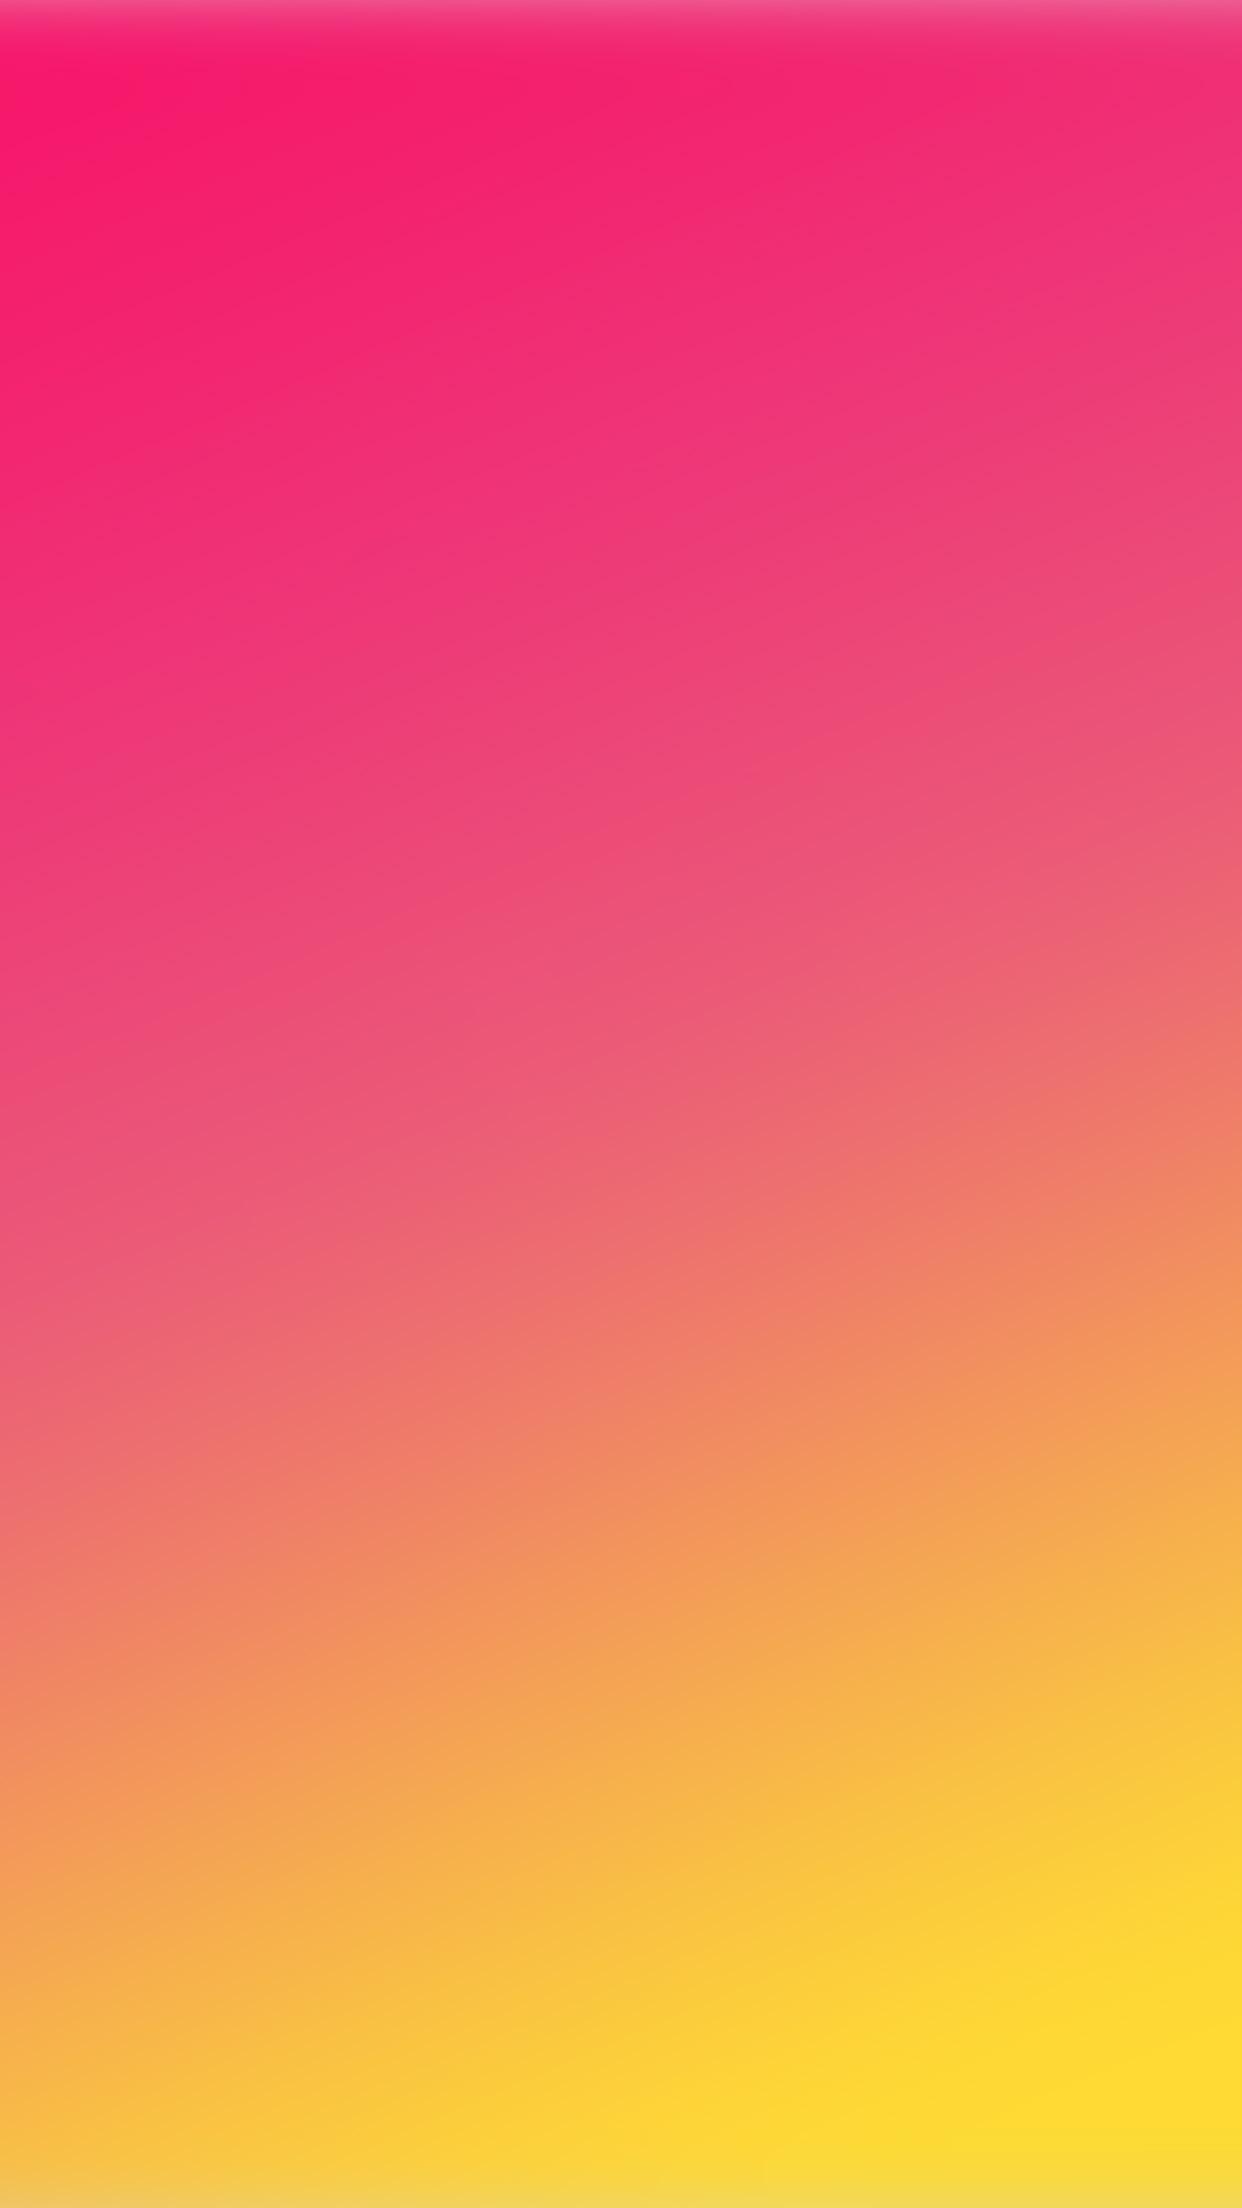 Sl78 red yellow summer blur gradation wallpaper - Color gradation wallpaper ...